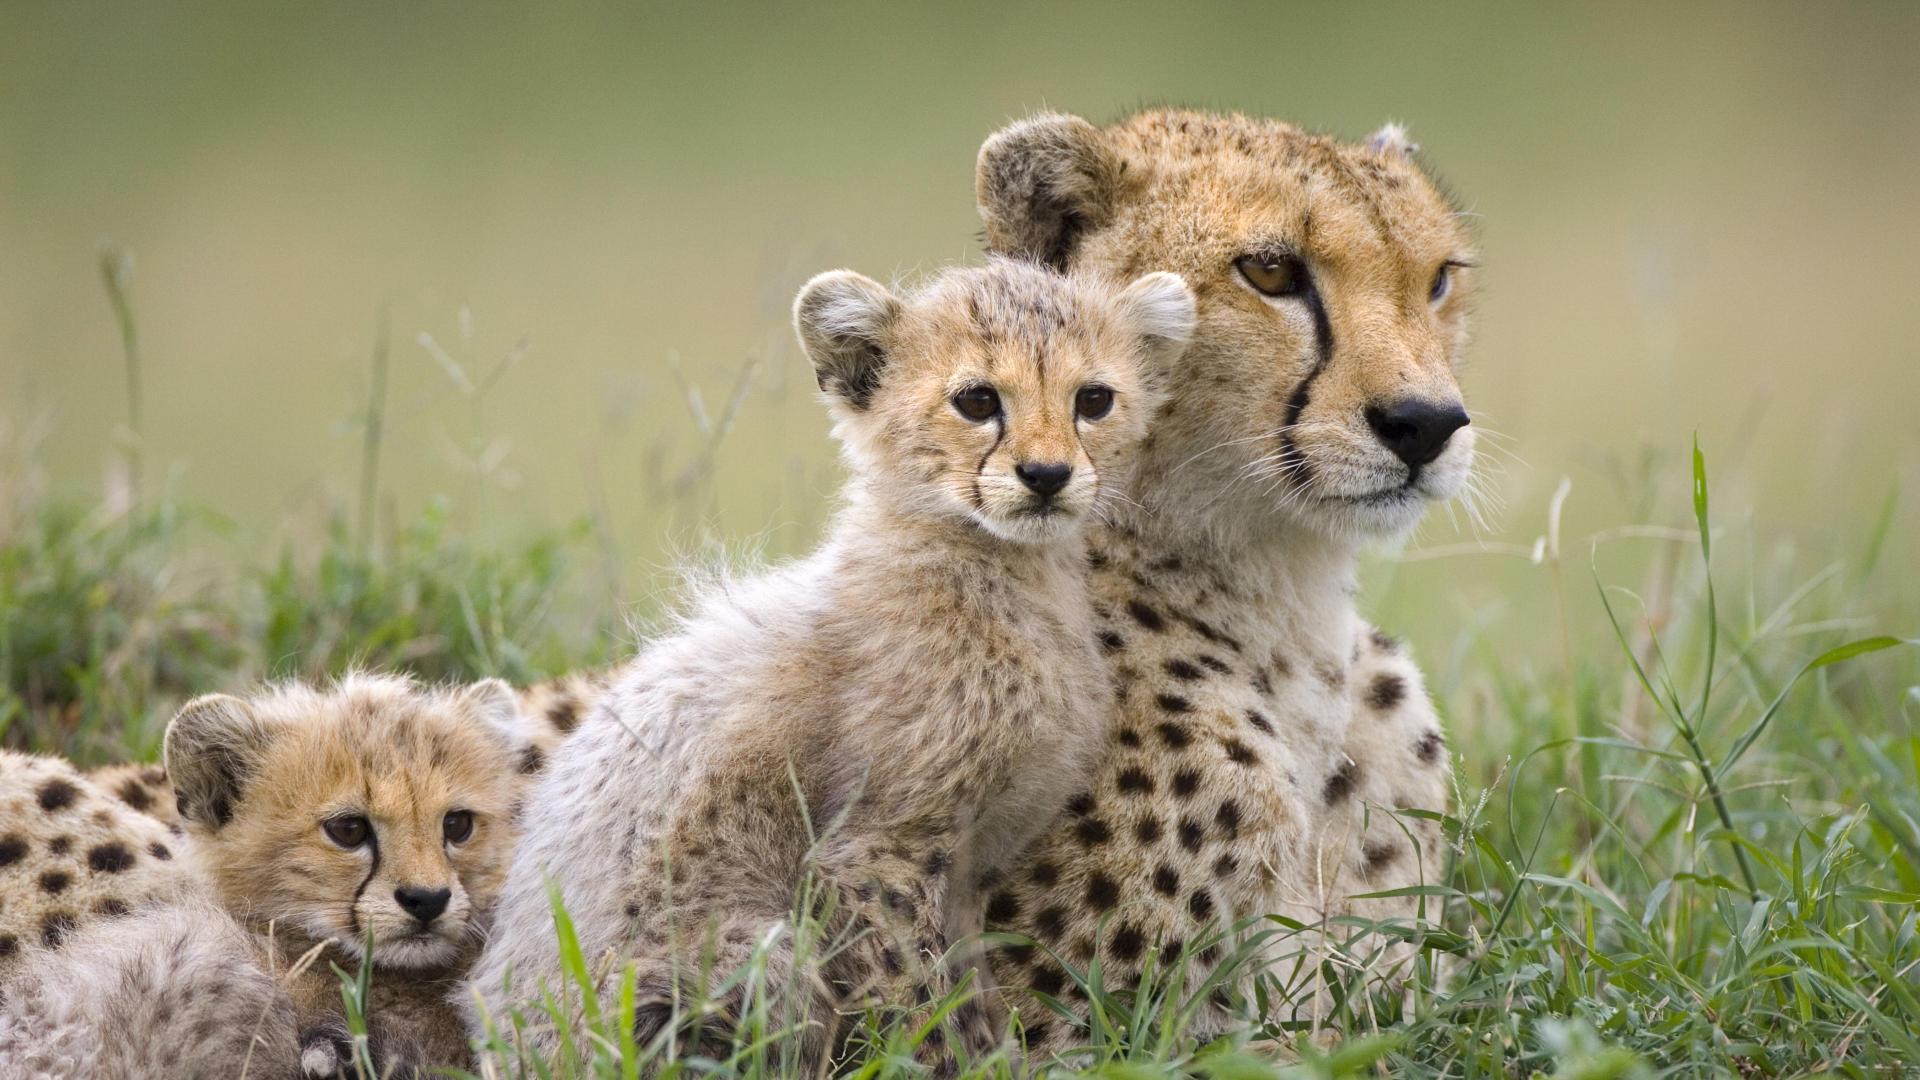 Cheetah-Mother-and-Cubs-Maasai-Mara-Reserve-Kenya-1.jpg